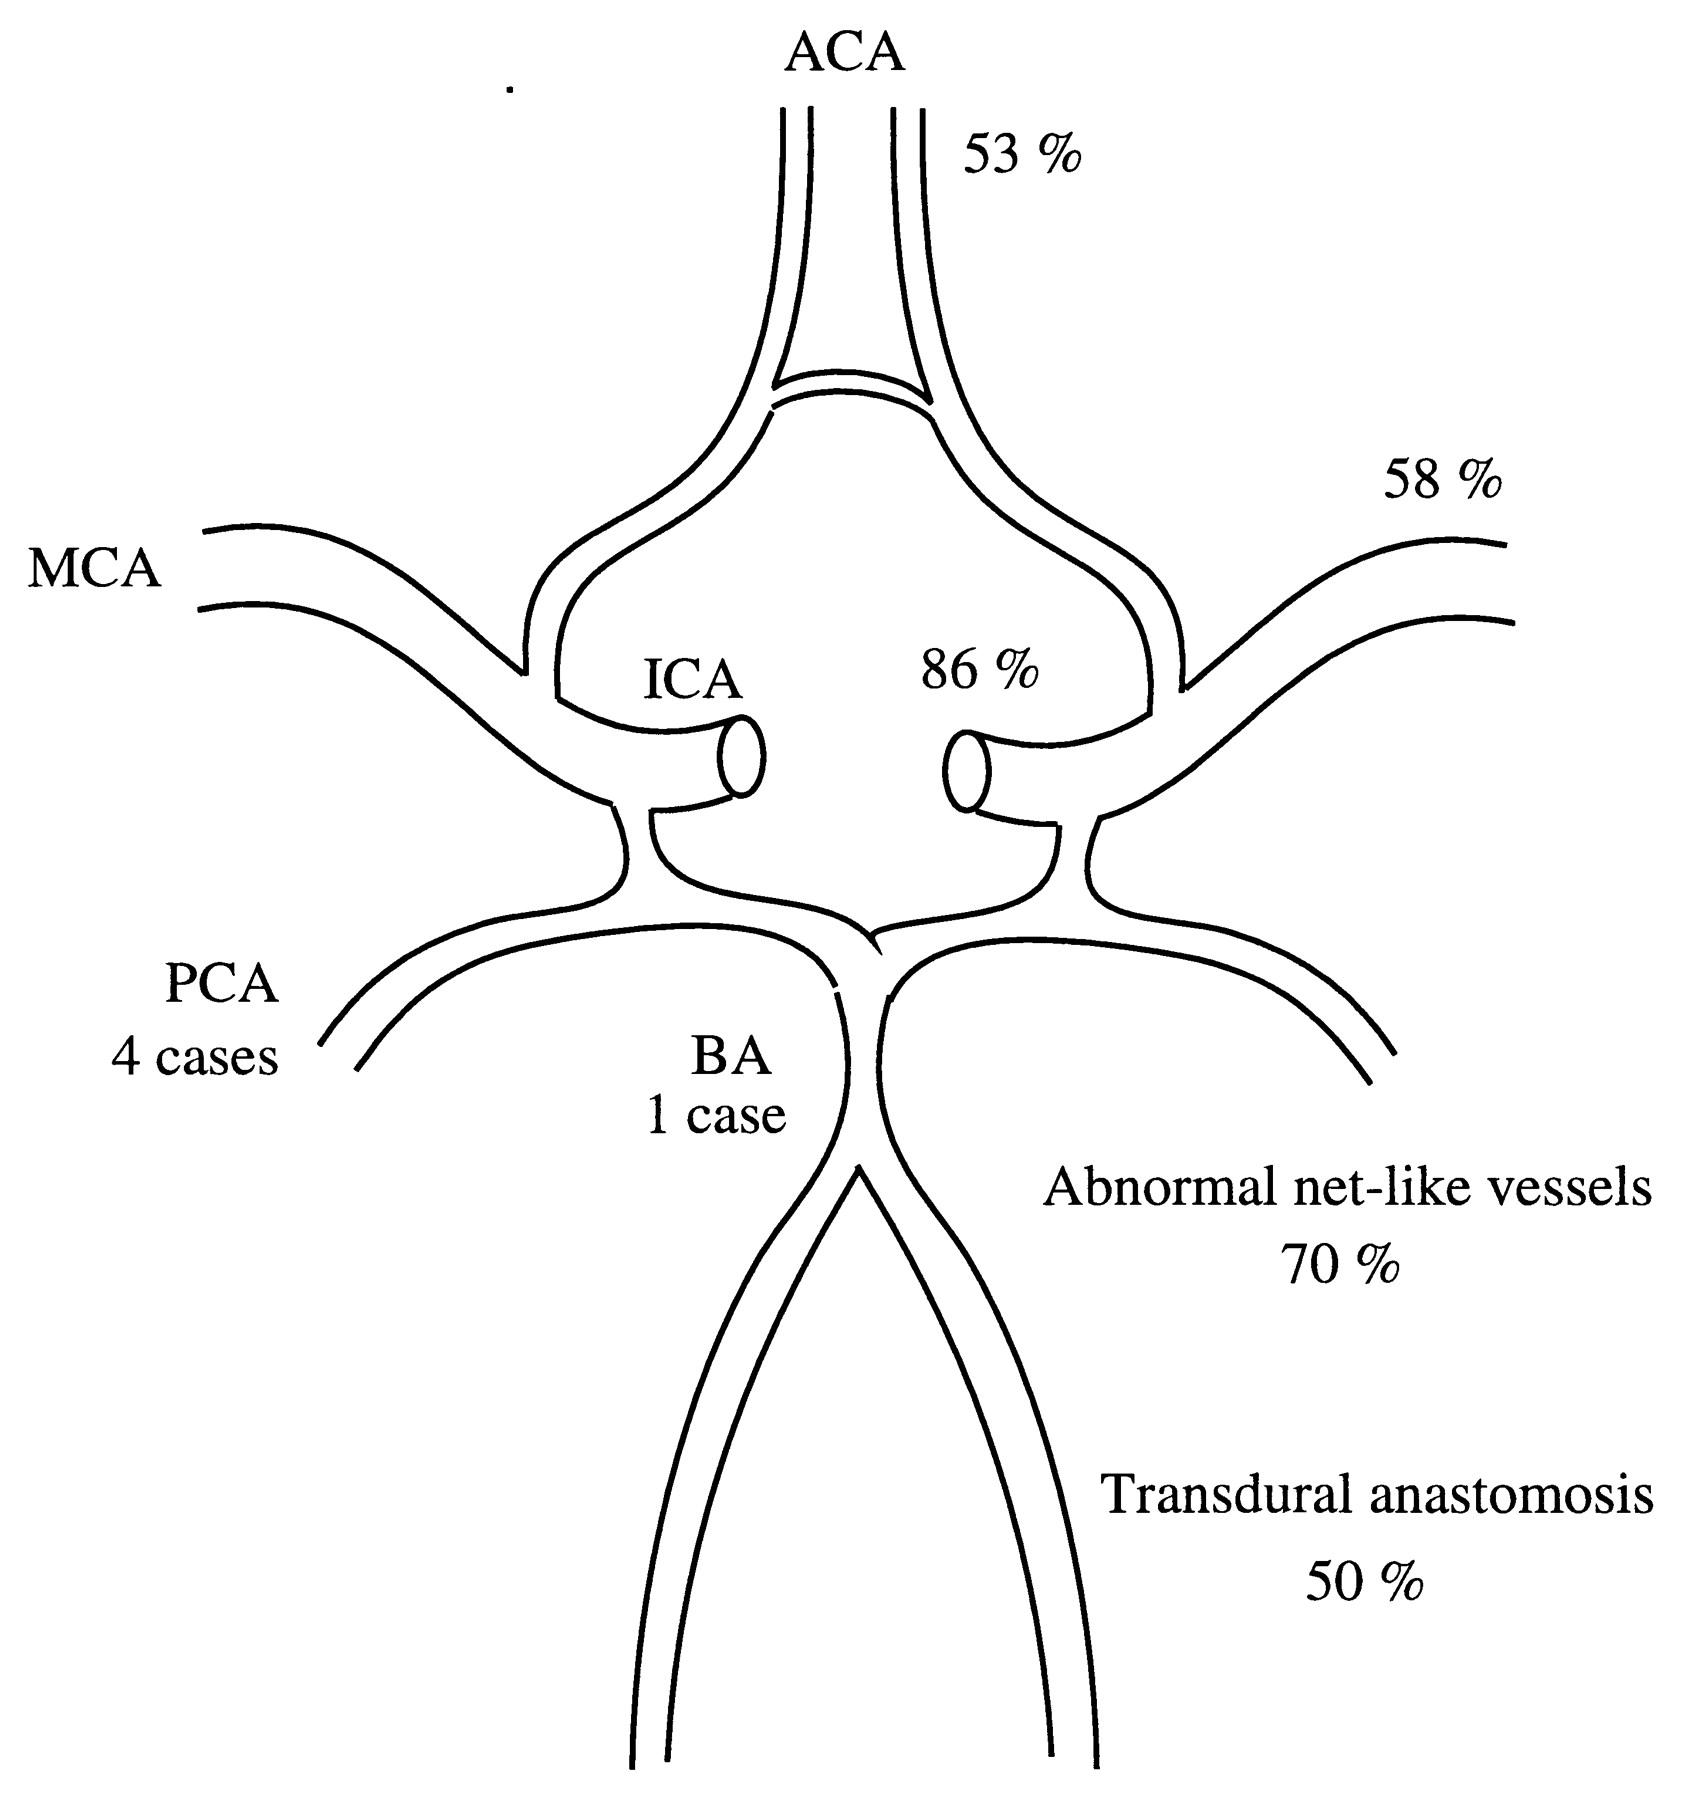 1691x1800 Progressive Cerebral Occlusive Disease After Radiation Therapy